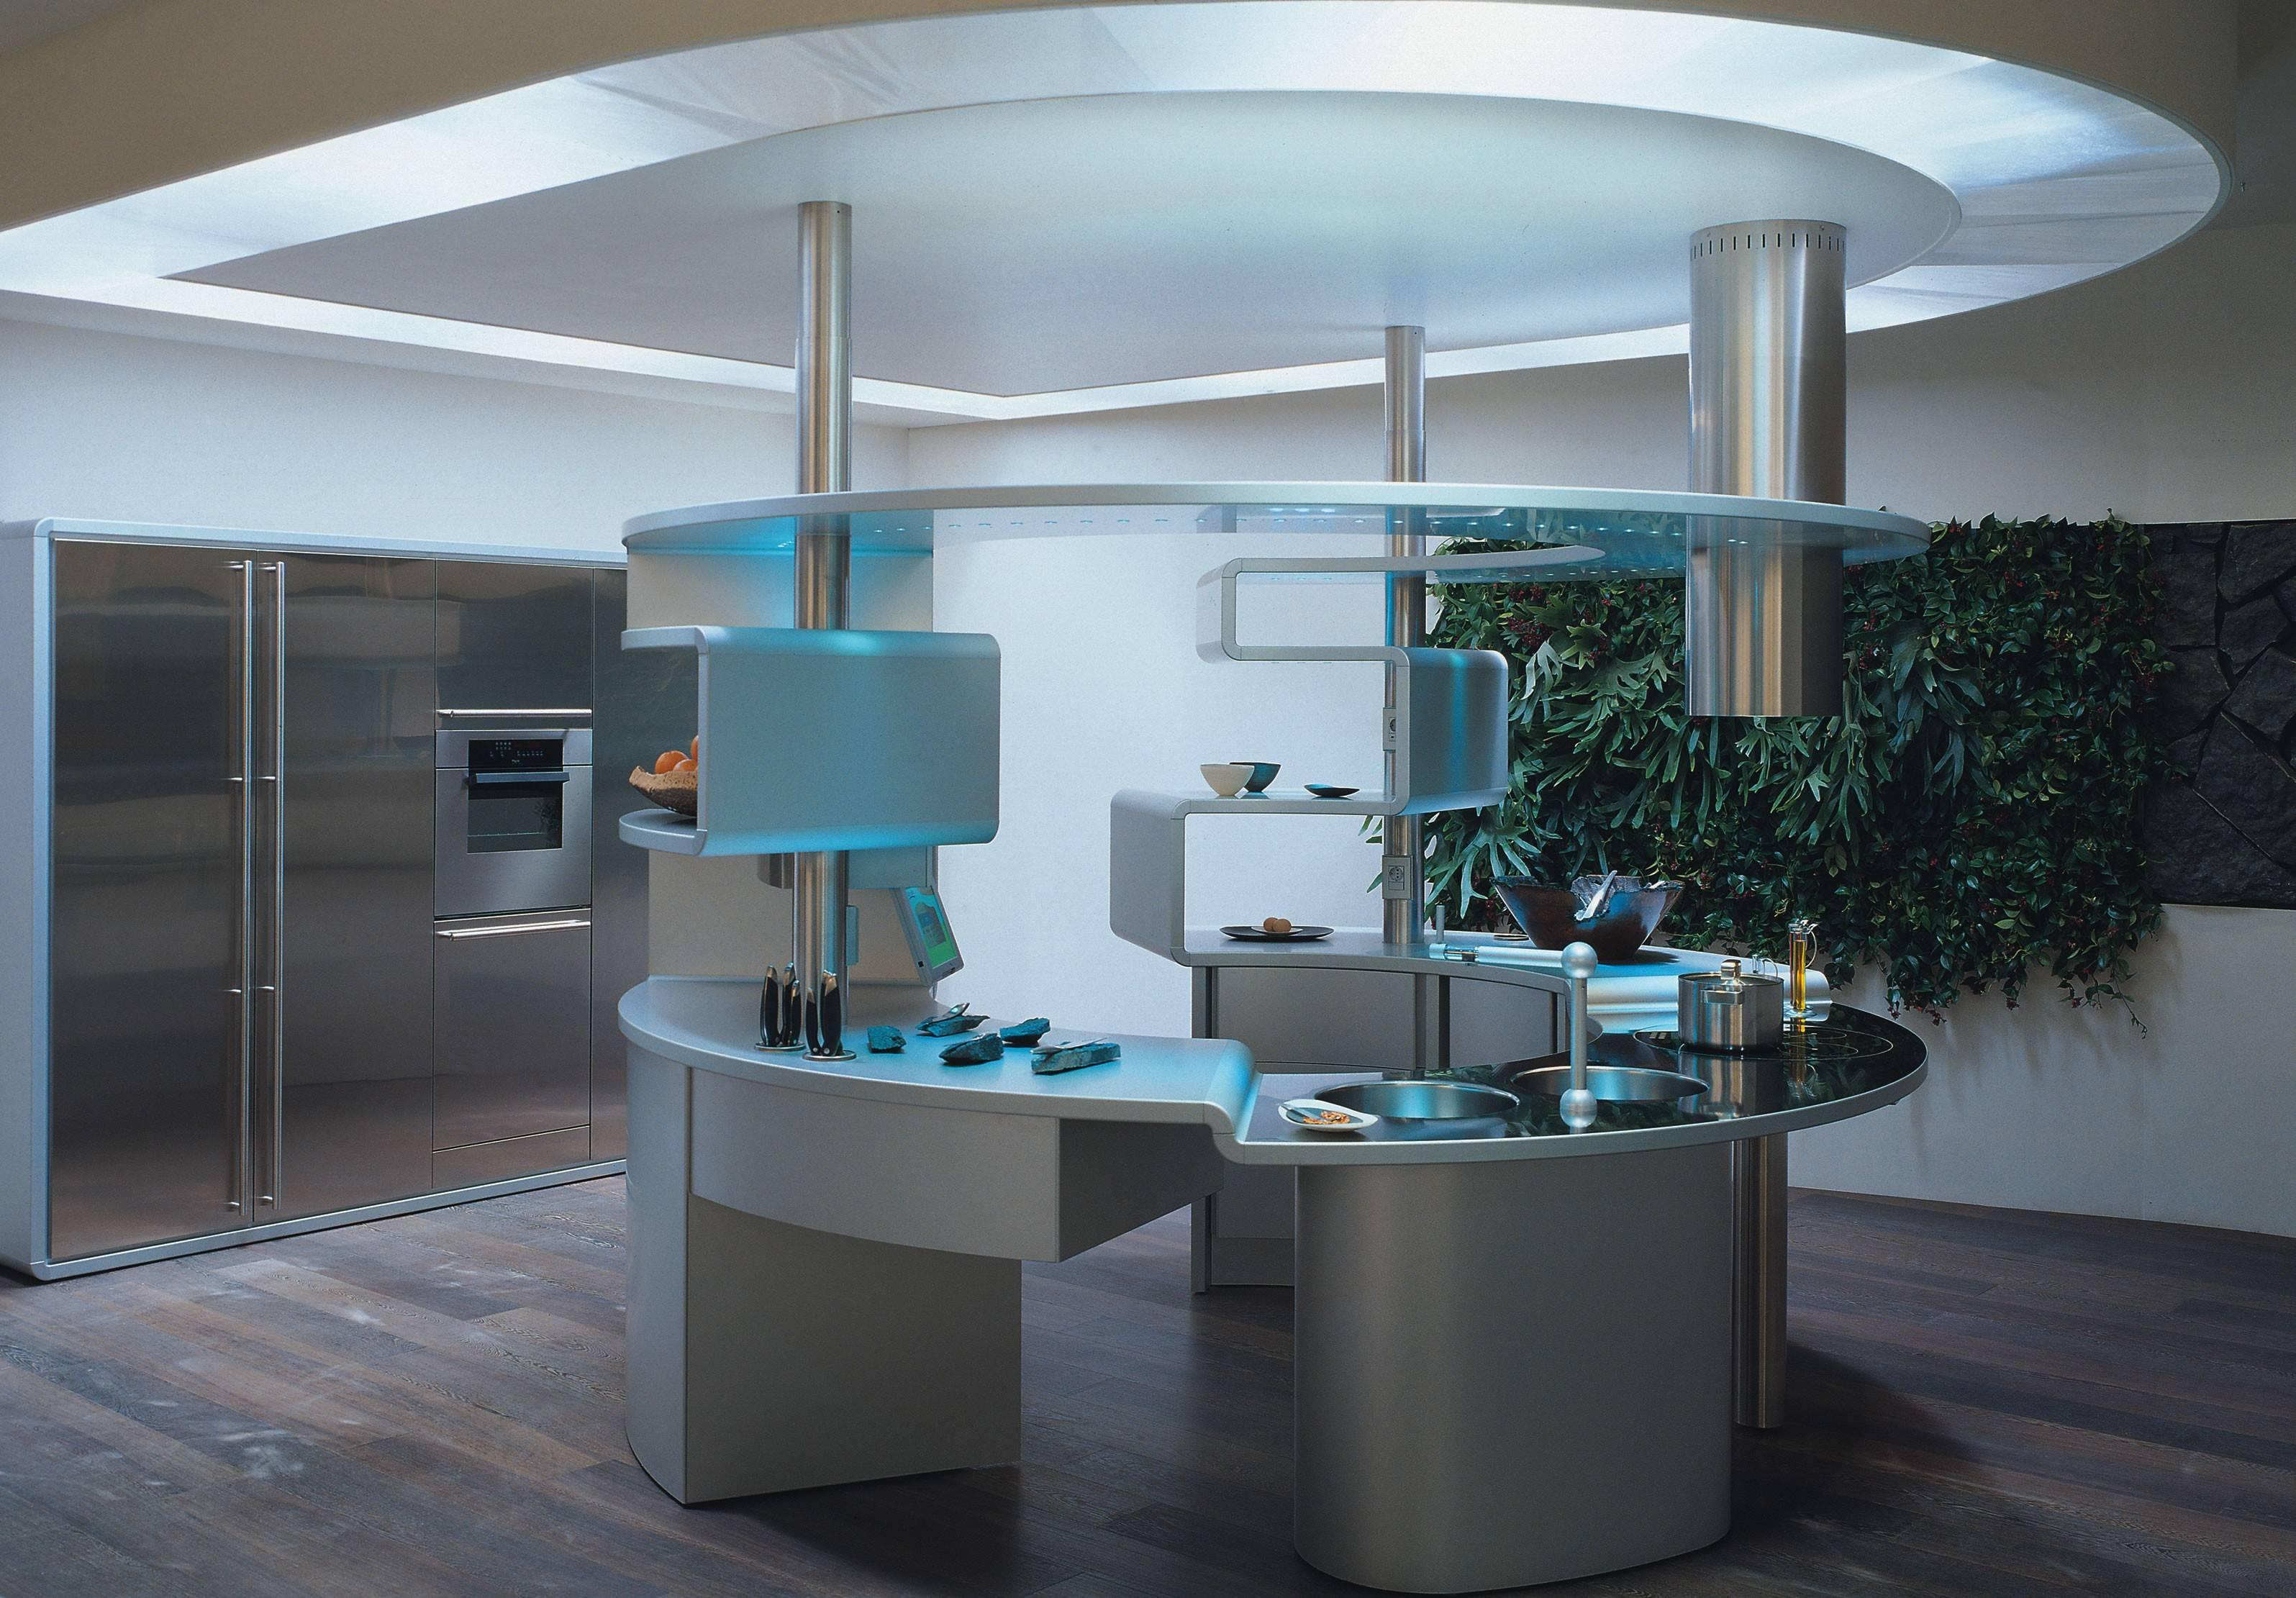 спб кухня будущего фото показ